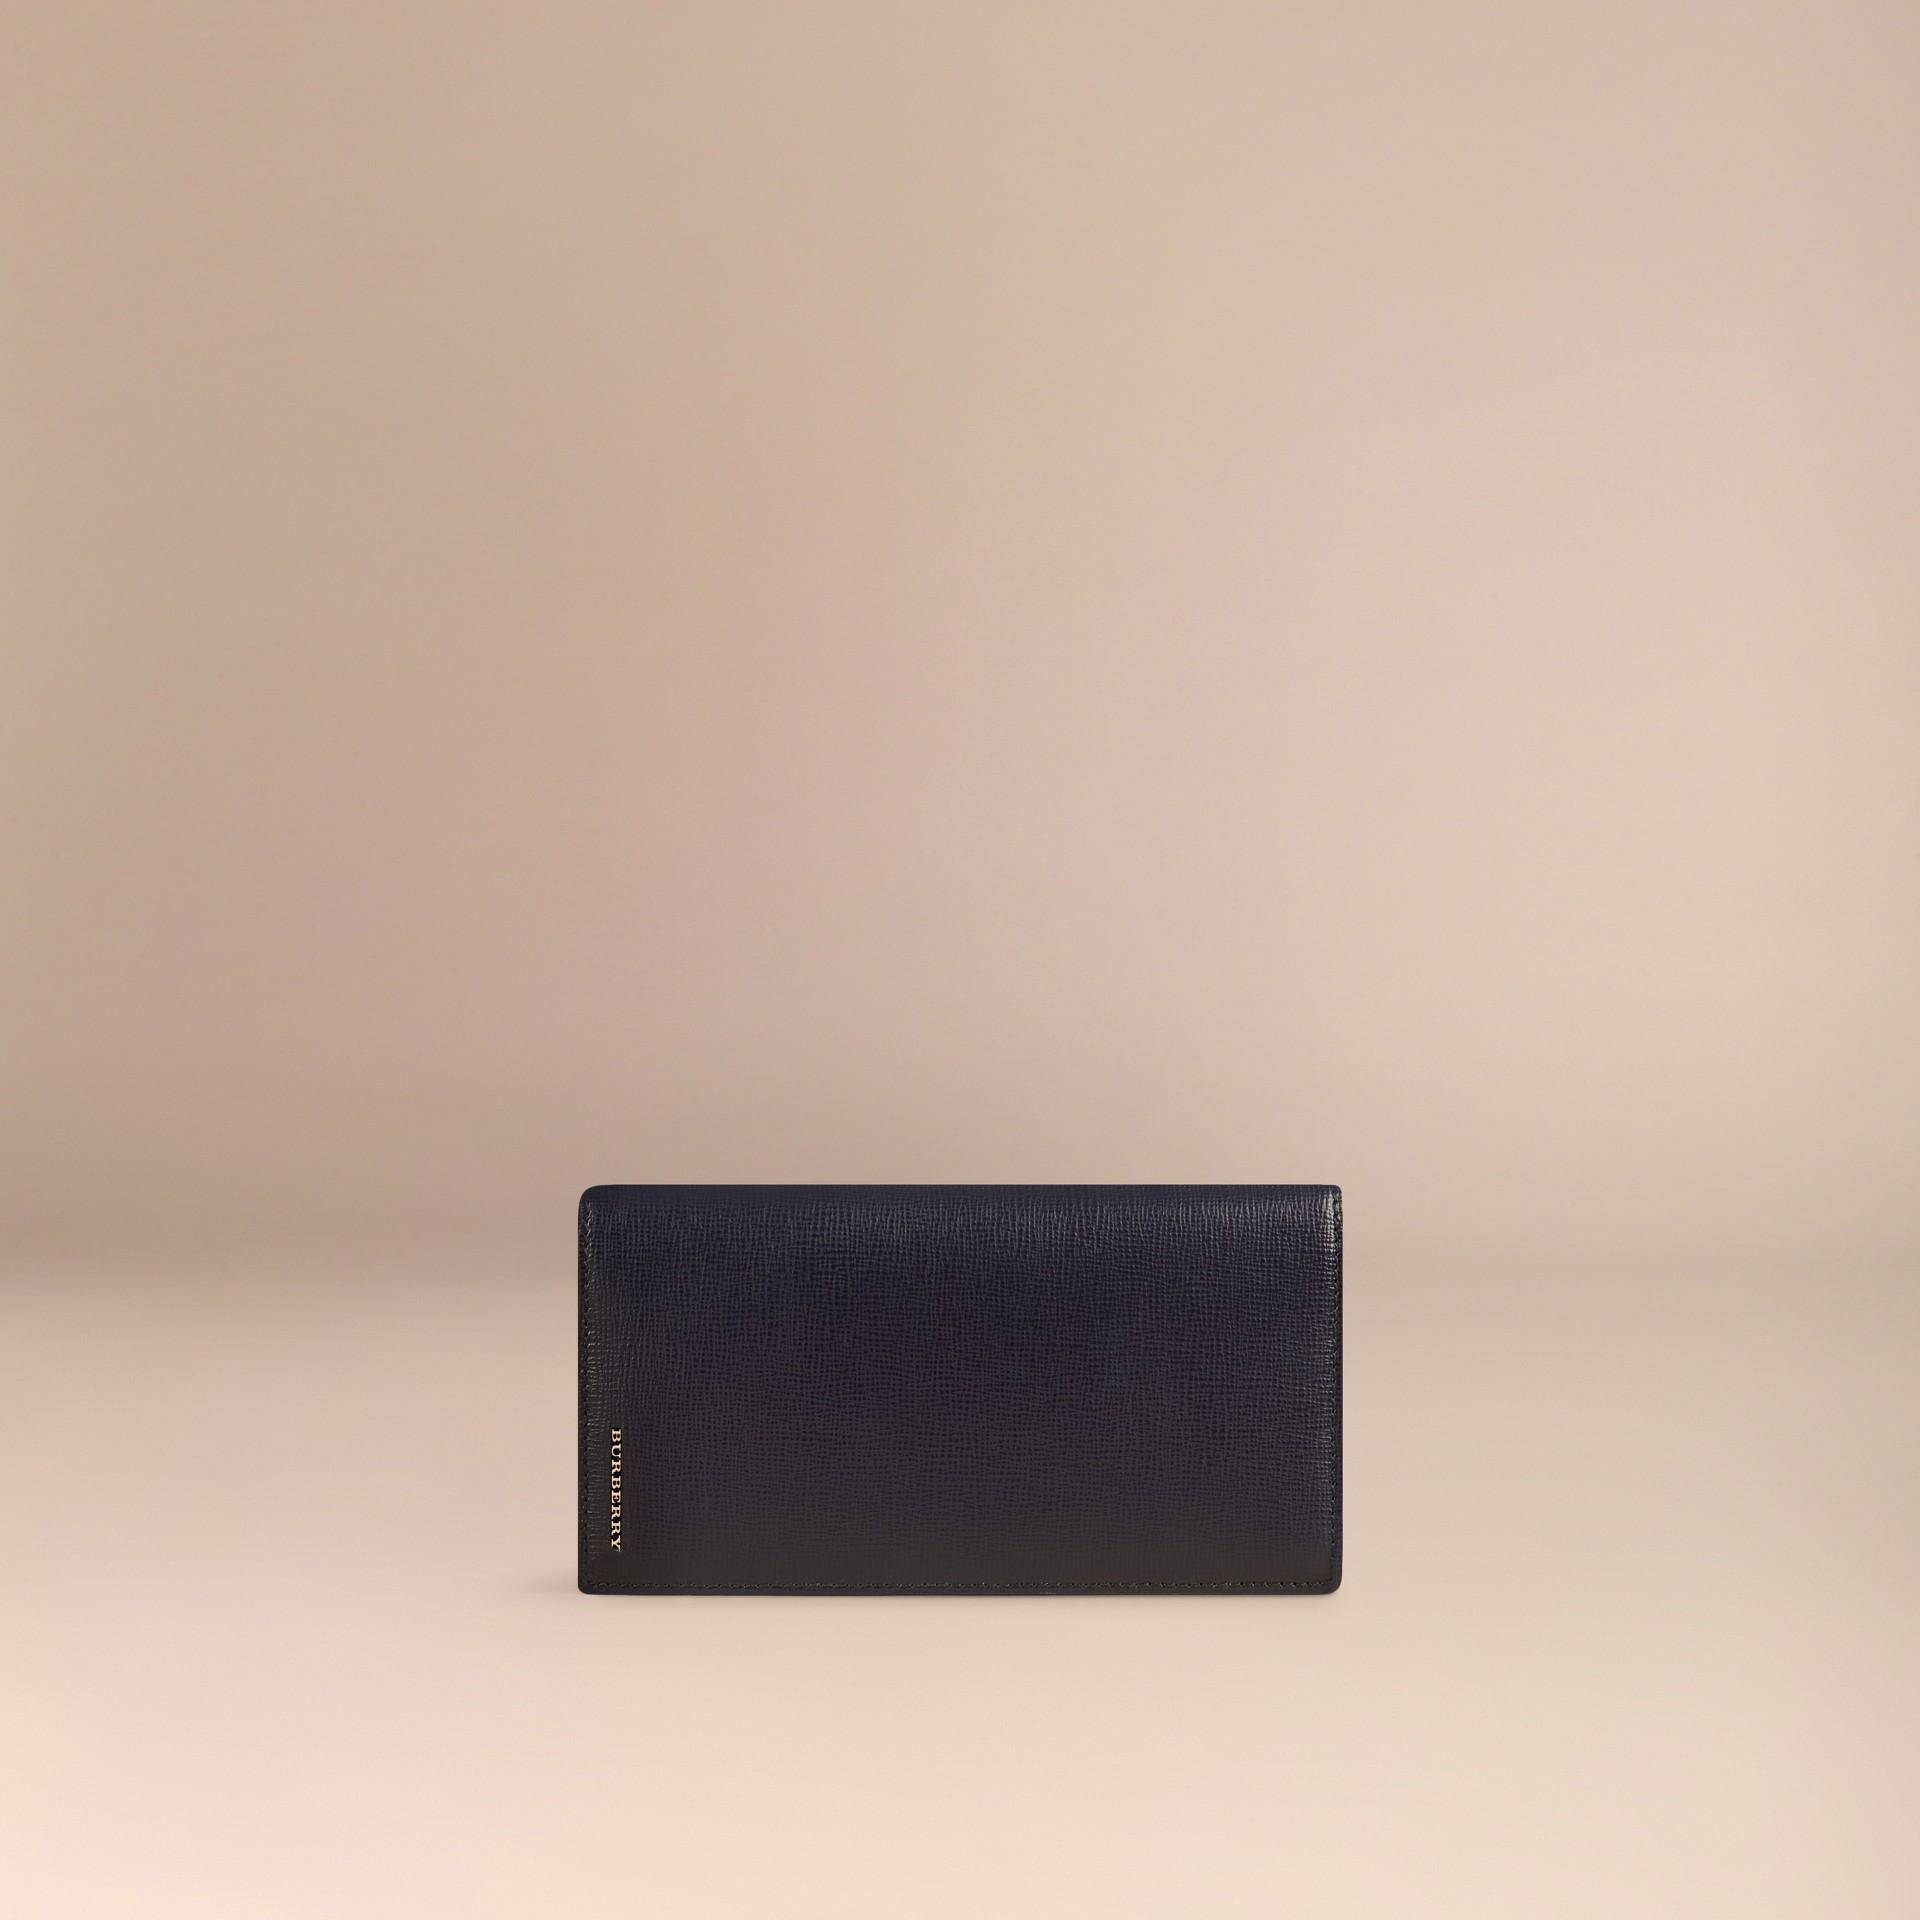 Dark navy London Leather Continental Wallet Dark Navy - gallery image 3